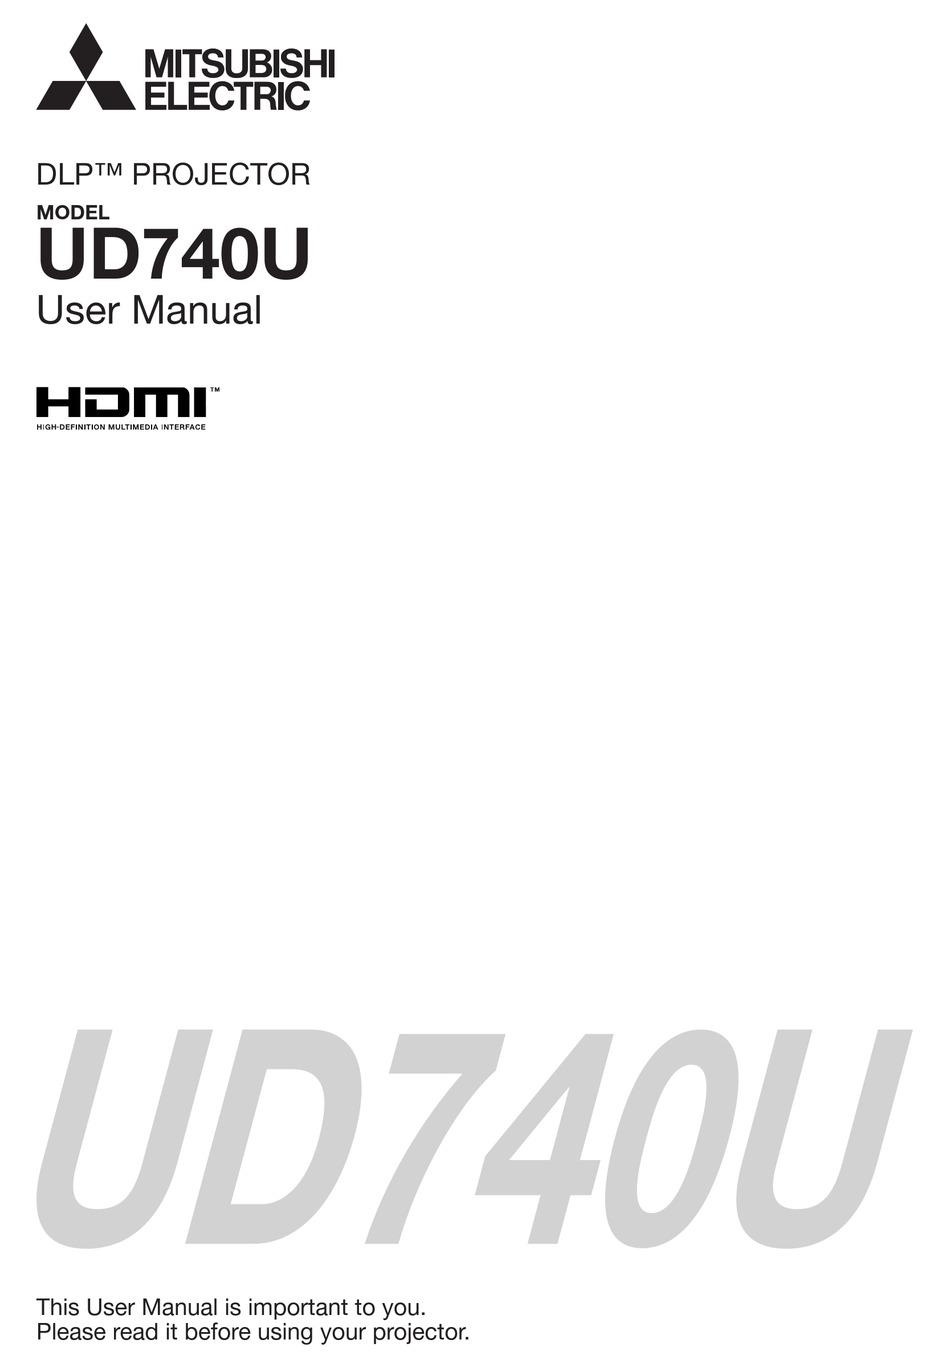 MITSUBISHI ELECTRIC DLP UD740U USER MANUAL Pdf Download